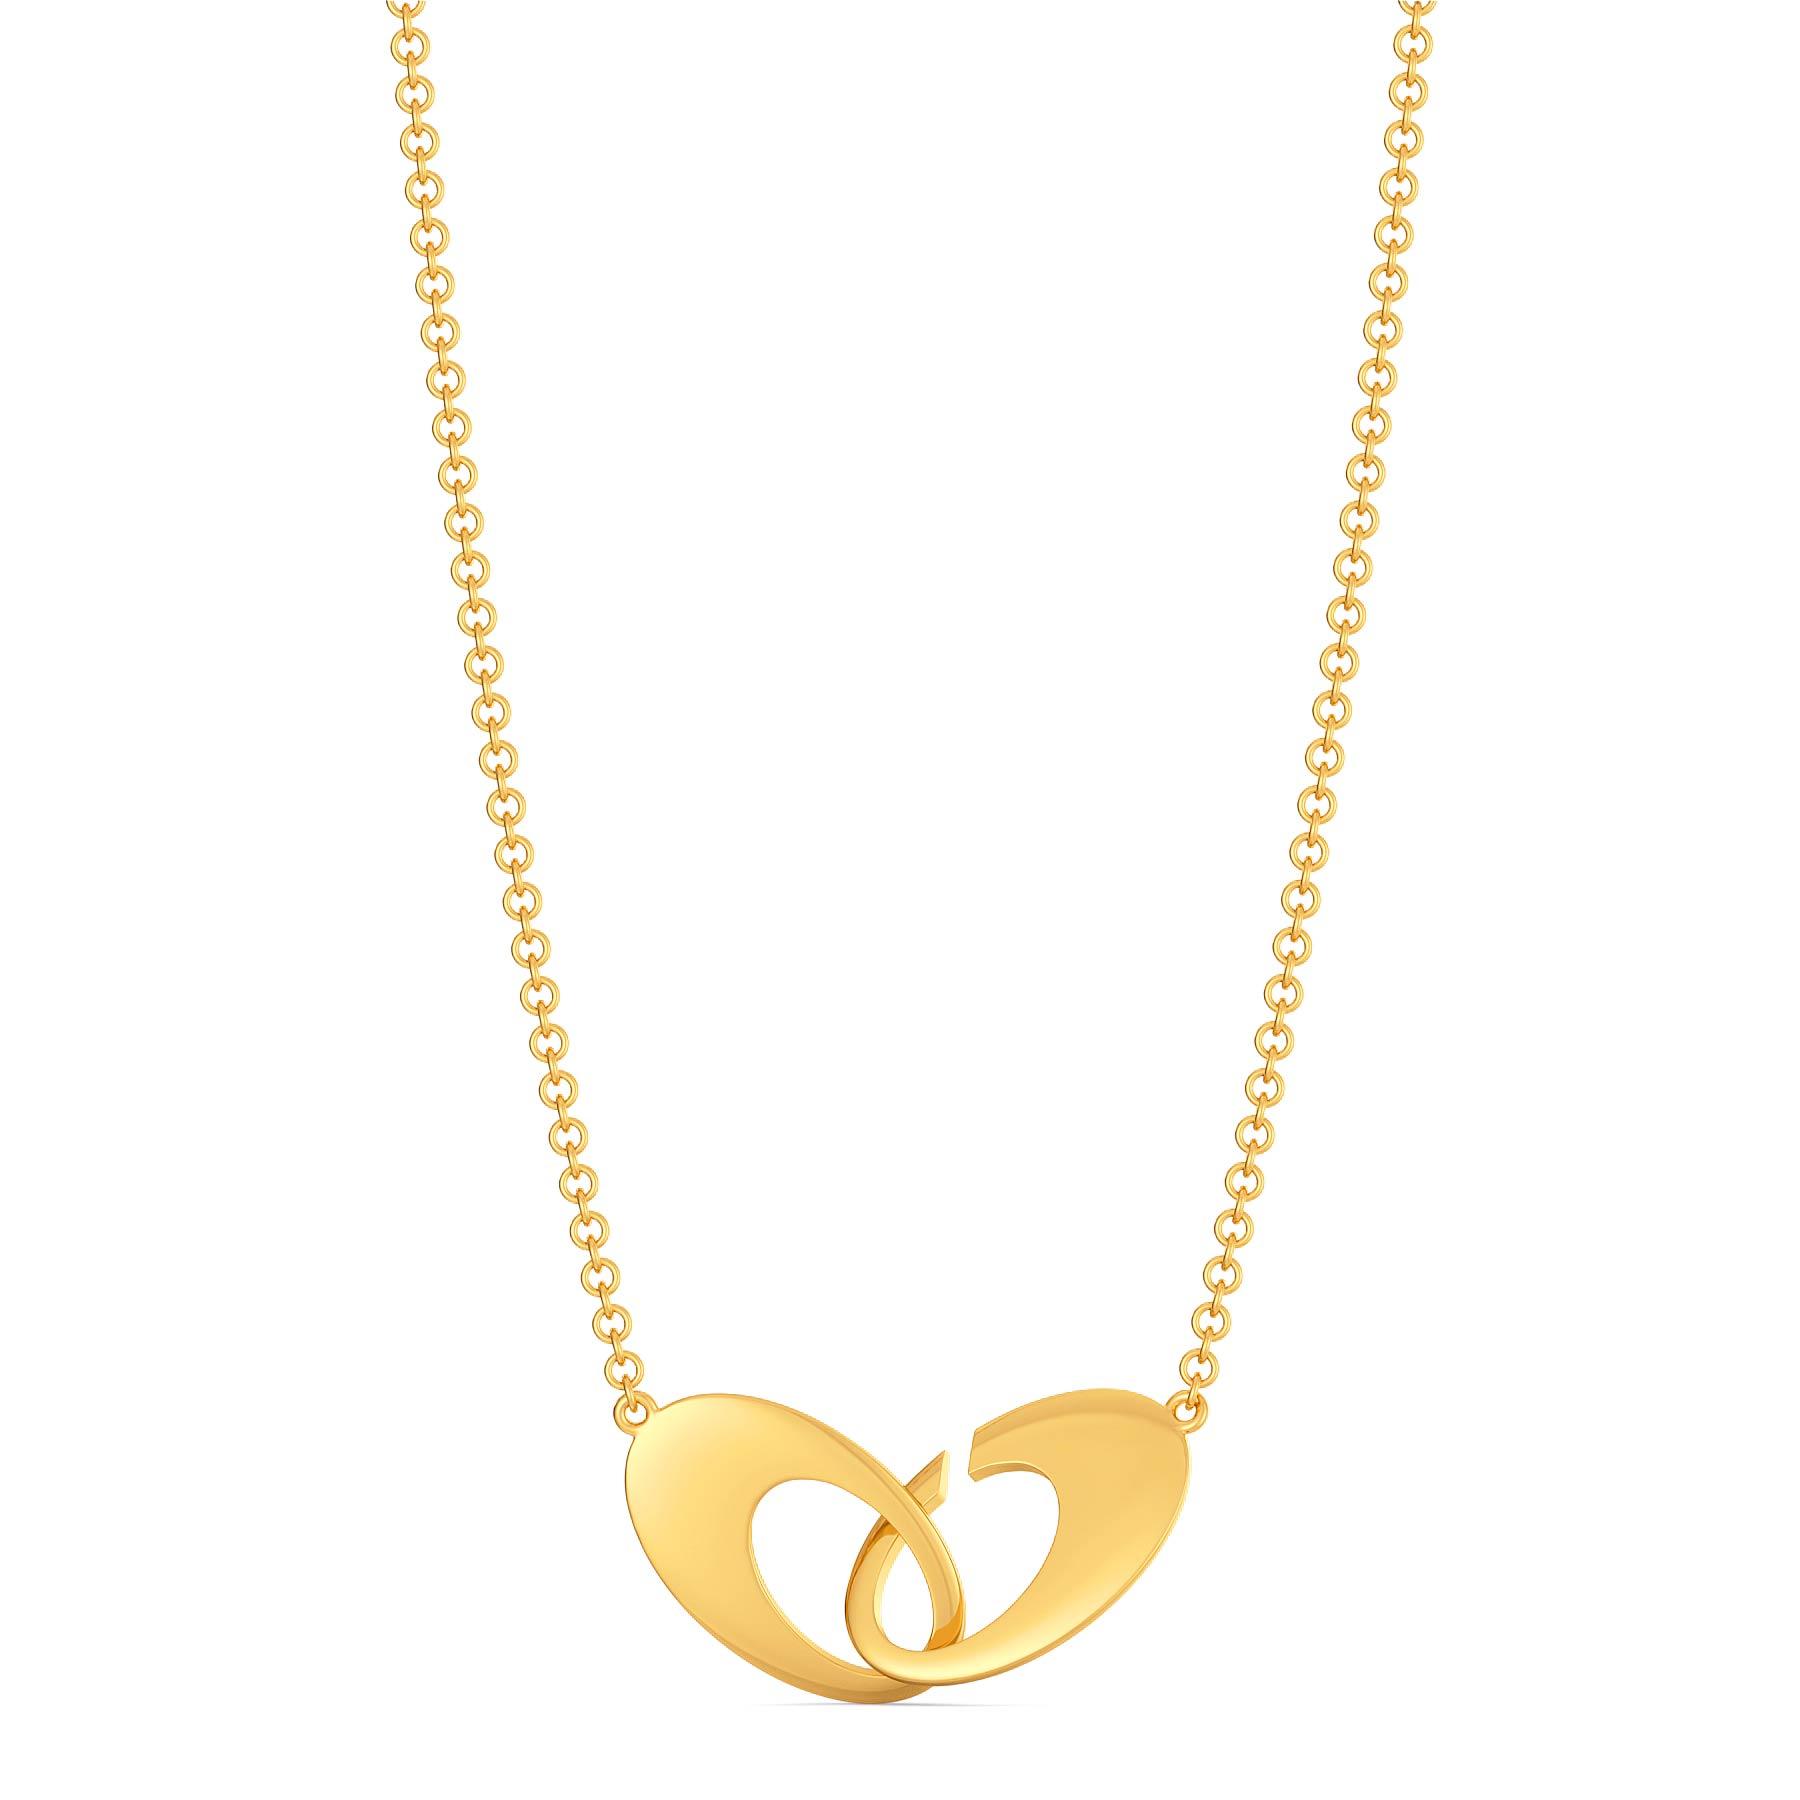 Torus Tie Gold Necklaces